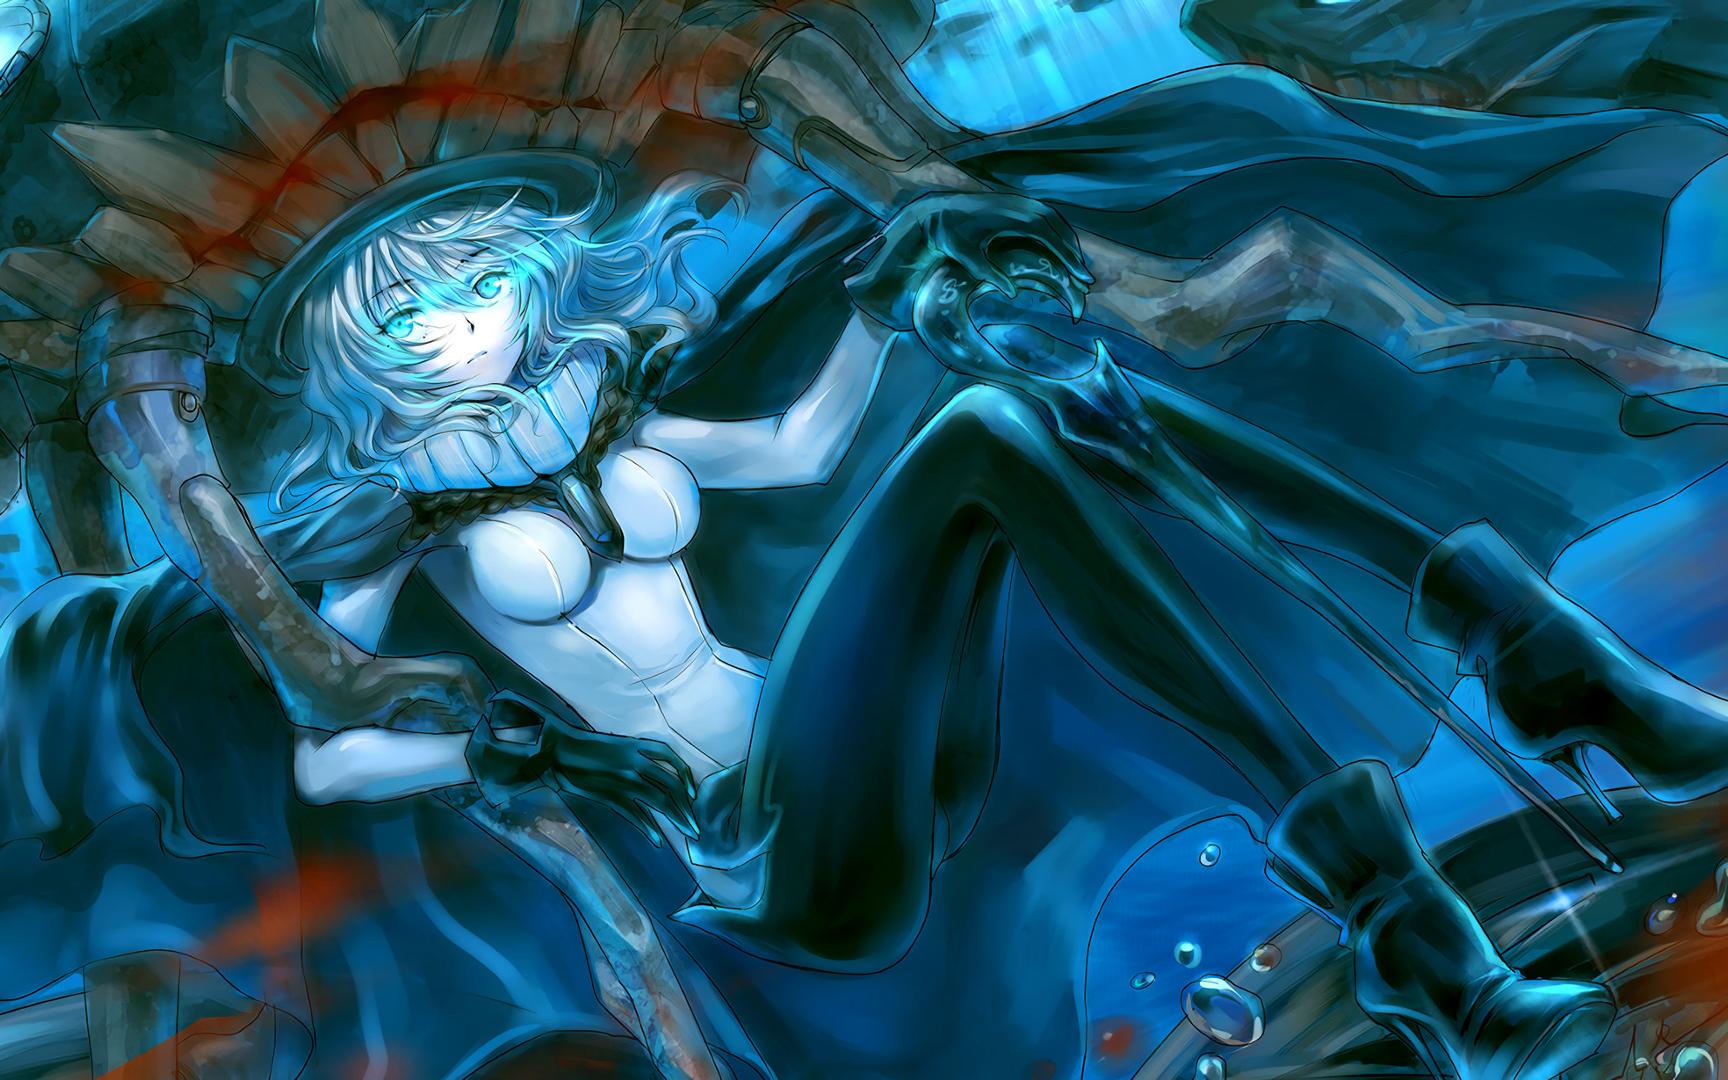 【OSU!】senya - 絶望の淵 [Abyssal] EZ SS